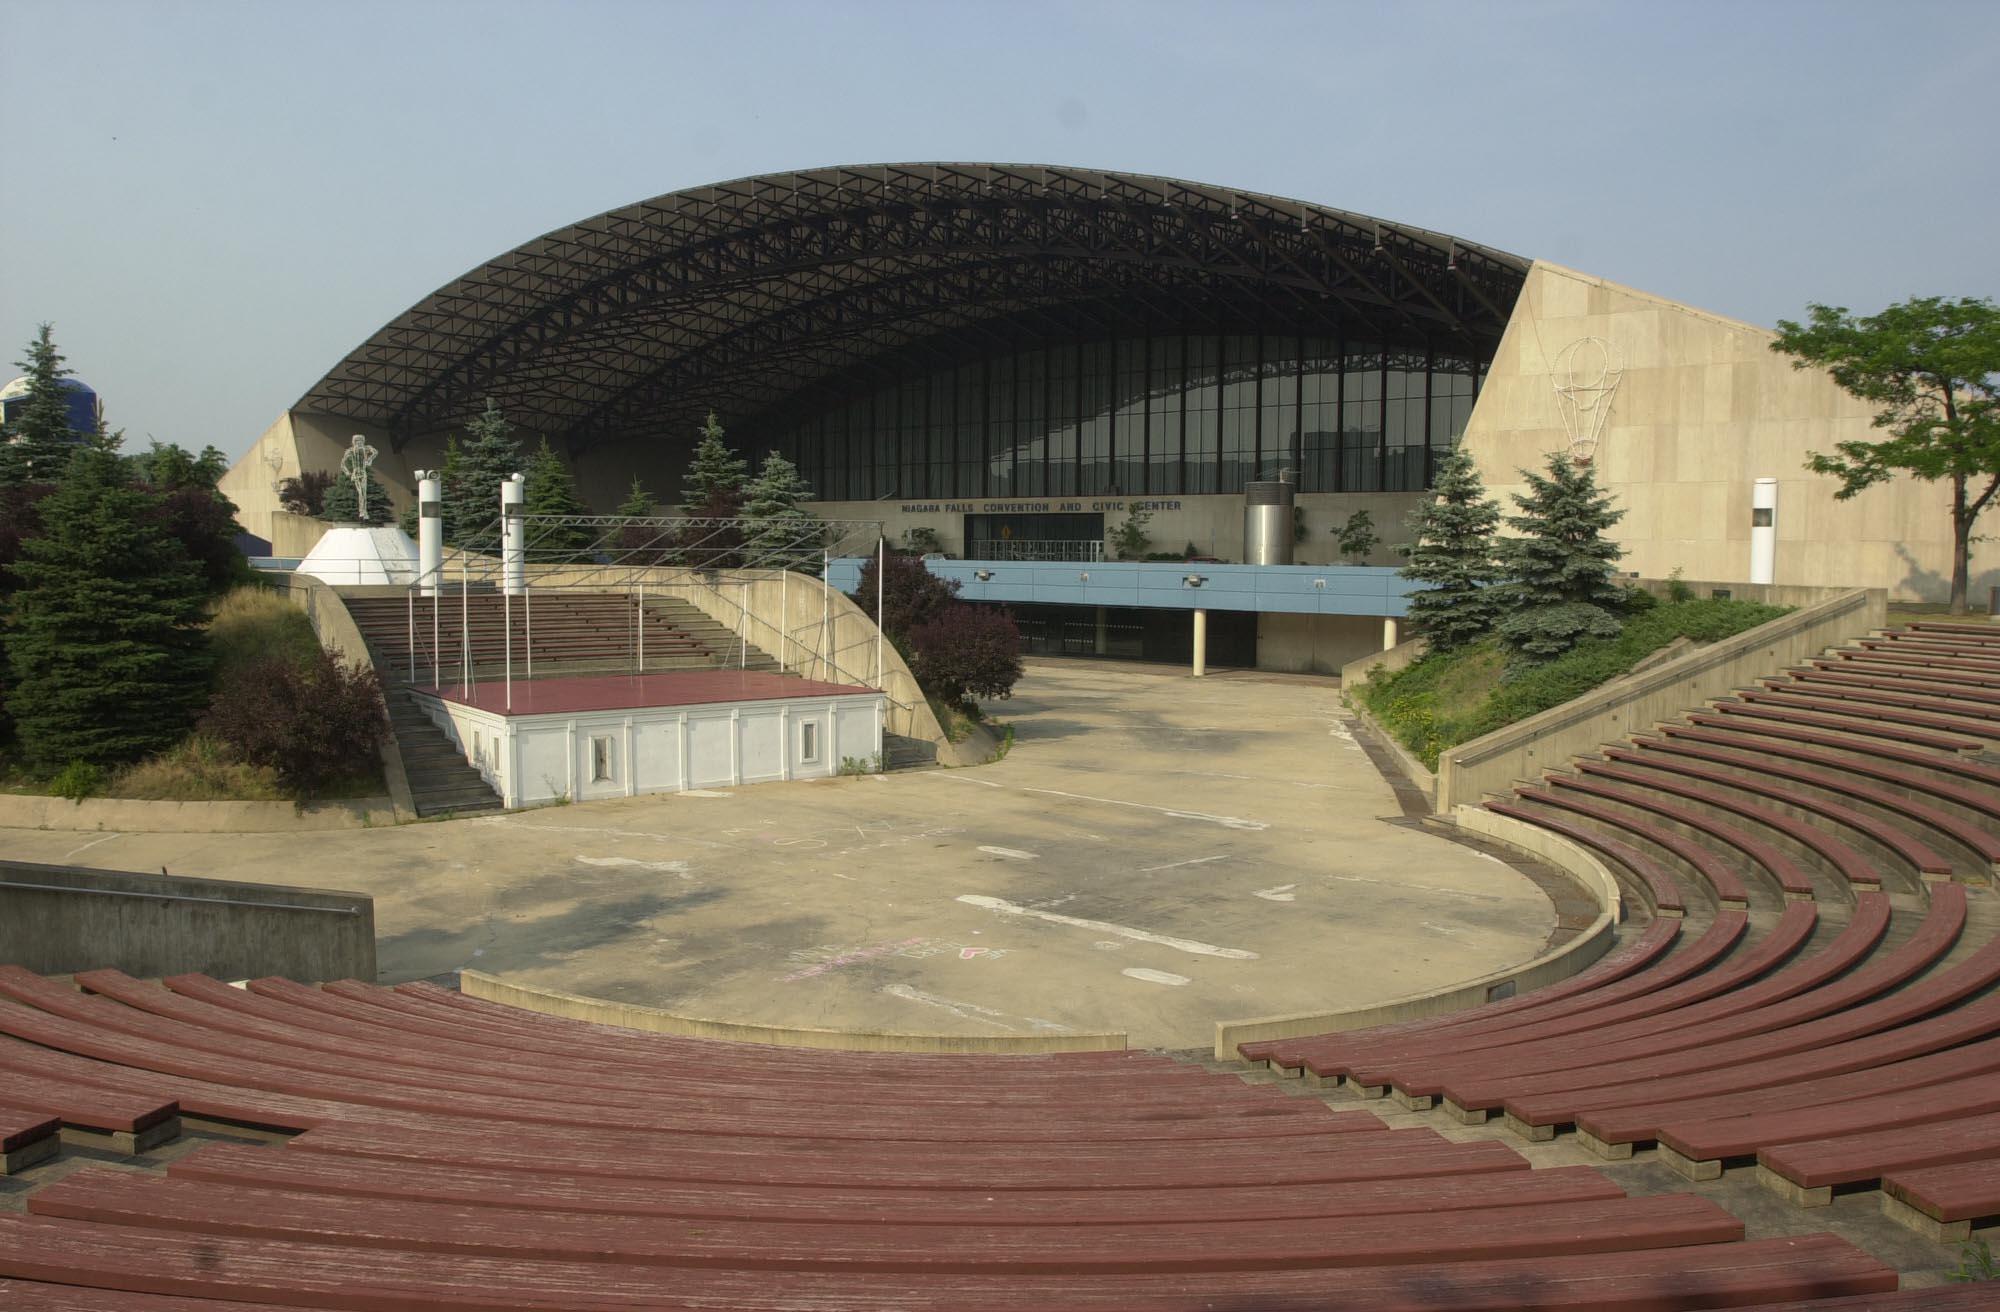 The former Niagara Falls Convention Center, from a file photo taken July 1, 2002. (John Hickey / The Buffalo News)